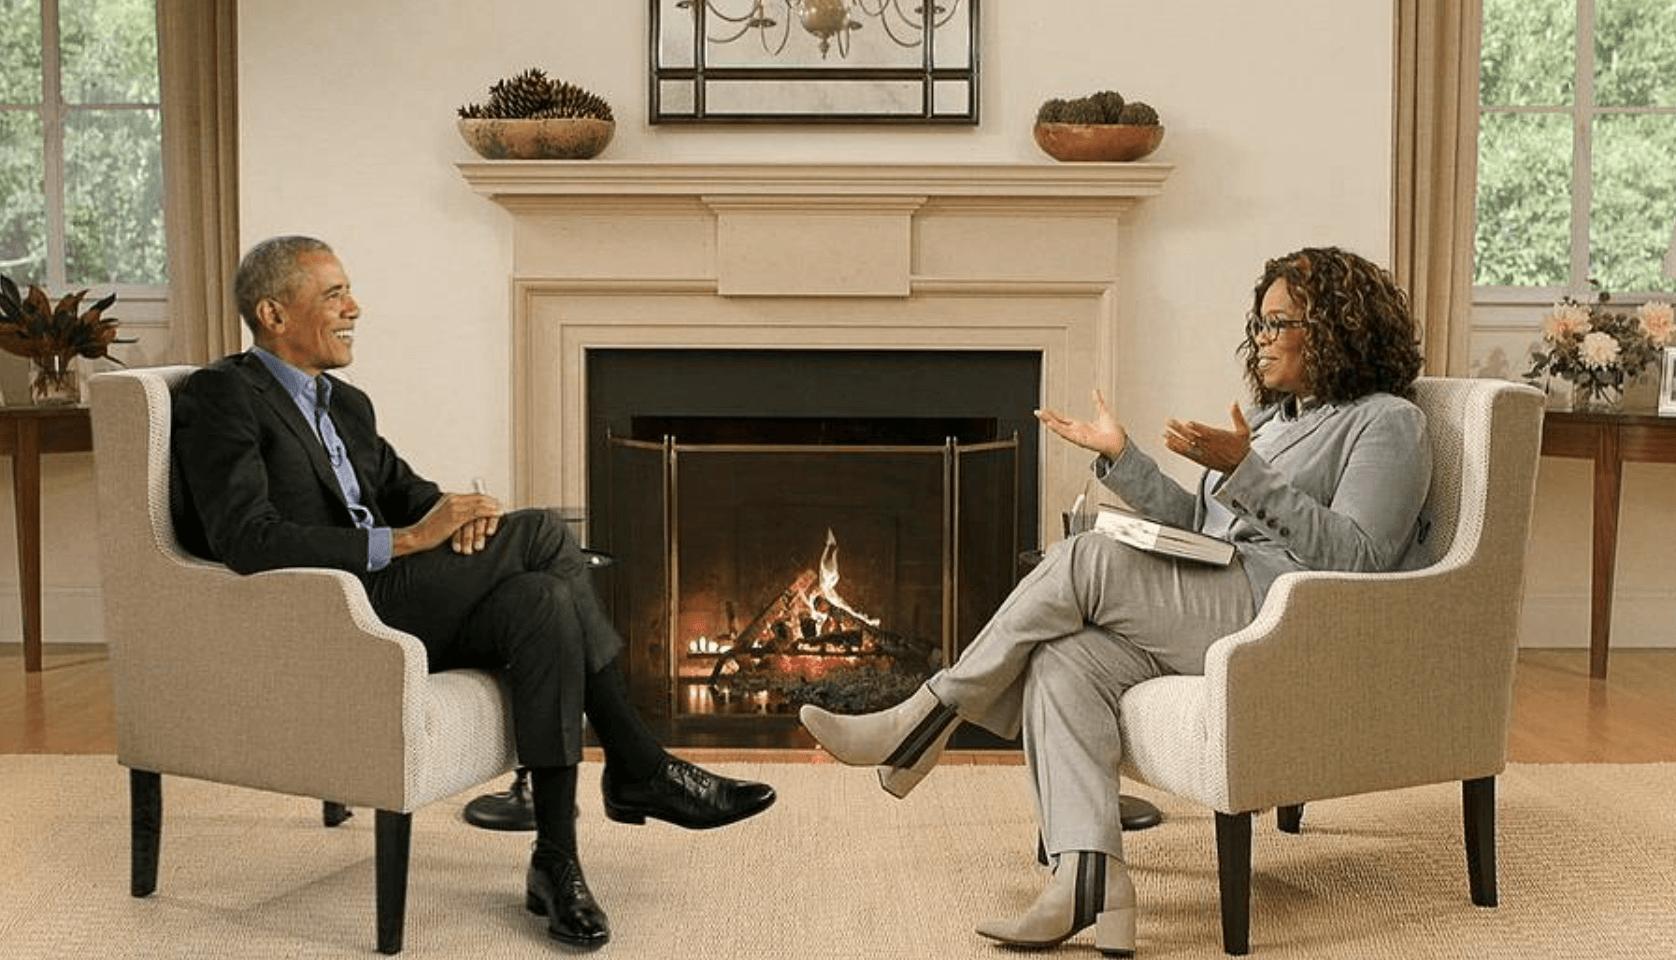 Oprah interviewing Obama on green screen